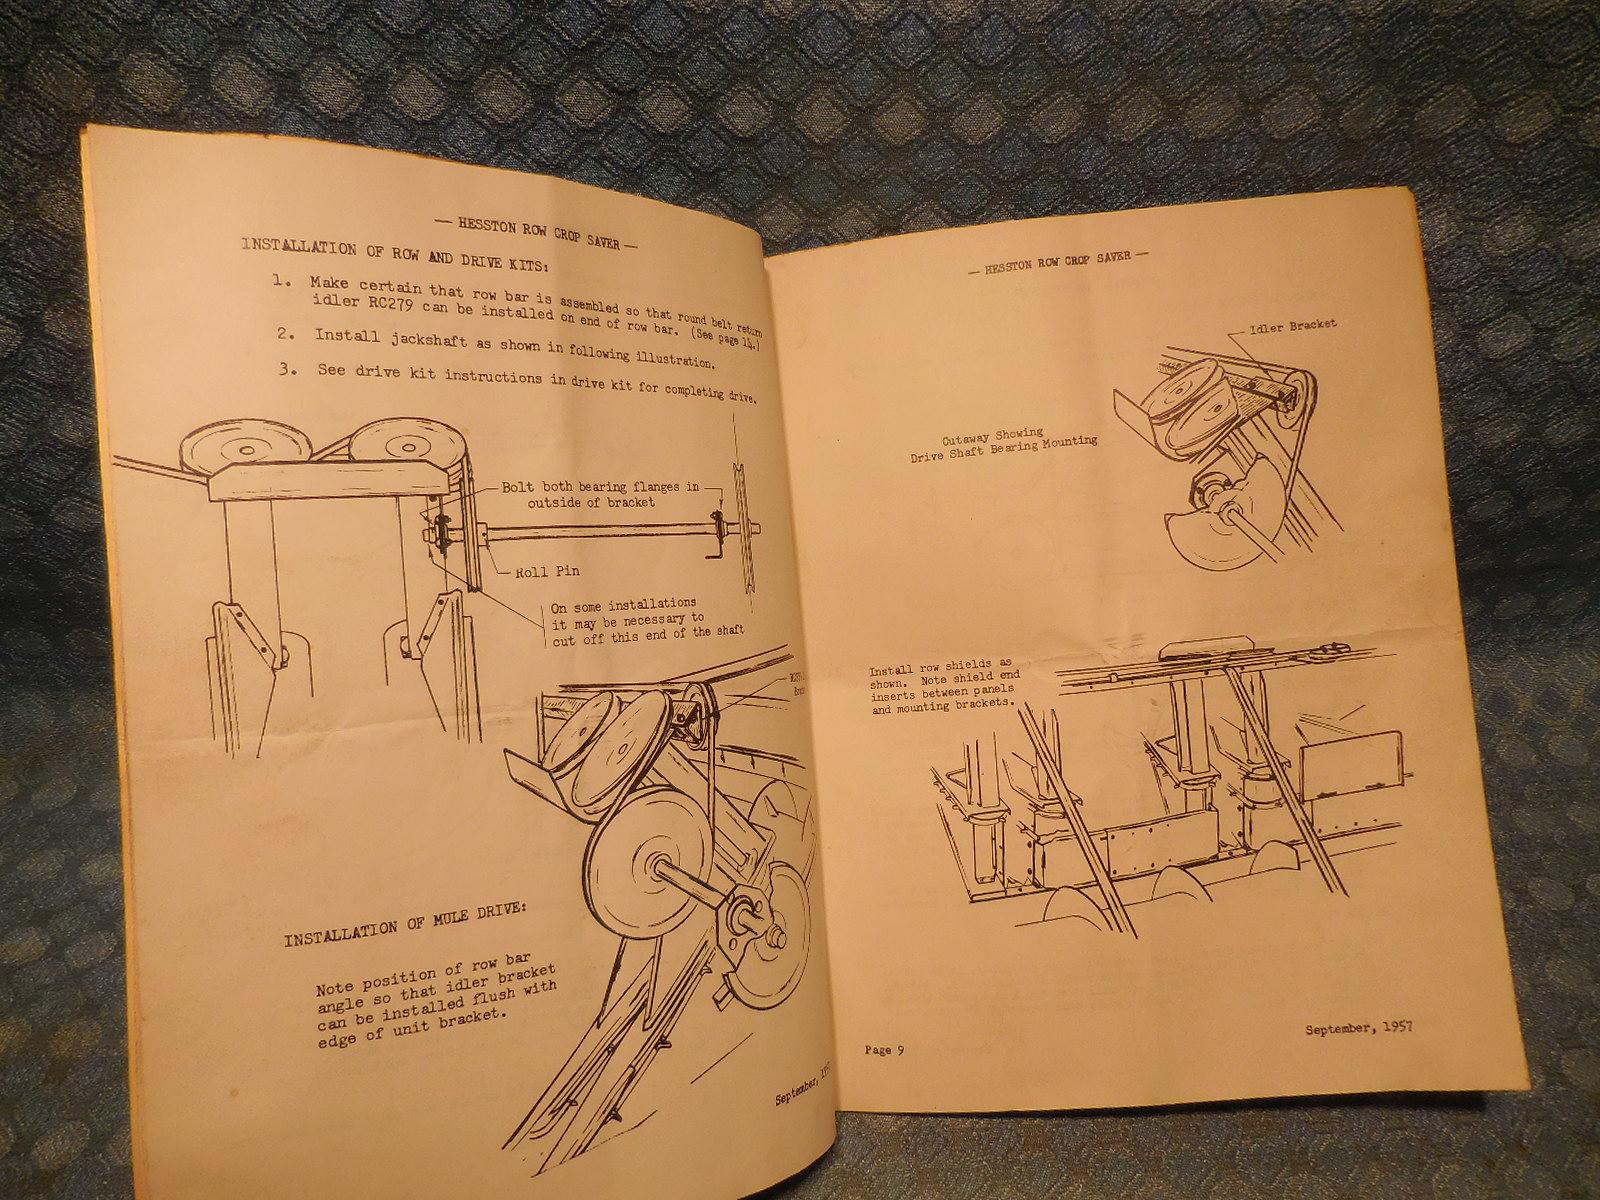 WRG-7488] Hesston Wiring Diagram on